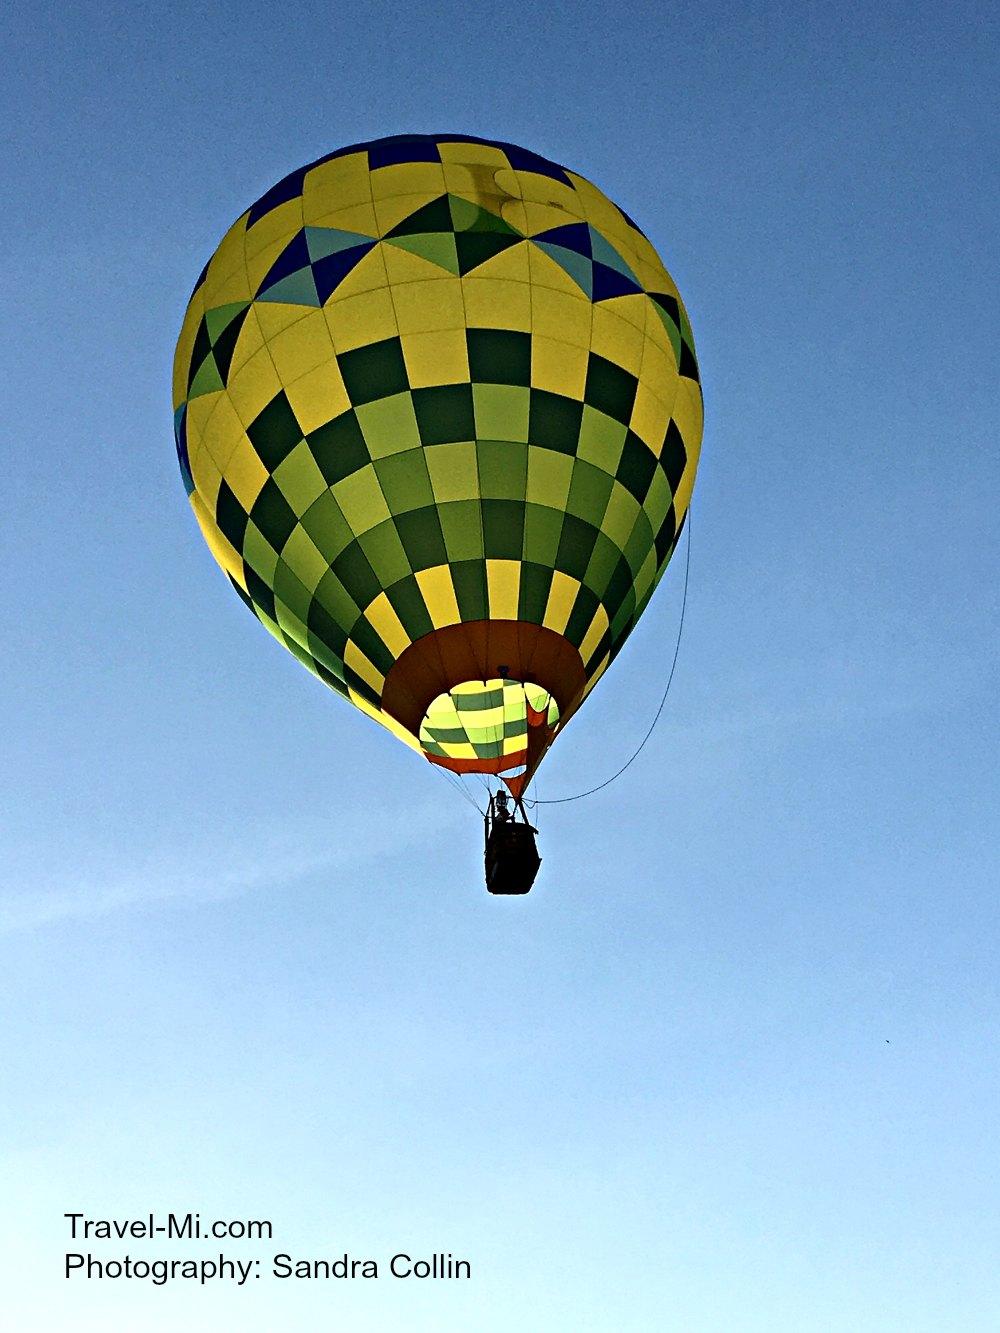 Balloon Fest Frankenmuth, Travel-mi.com